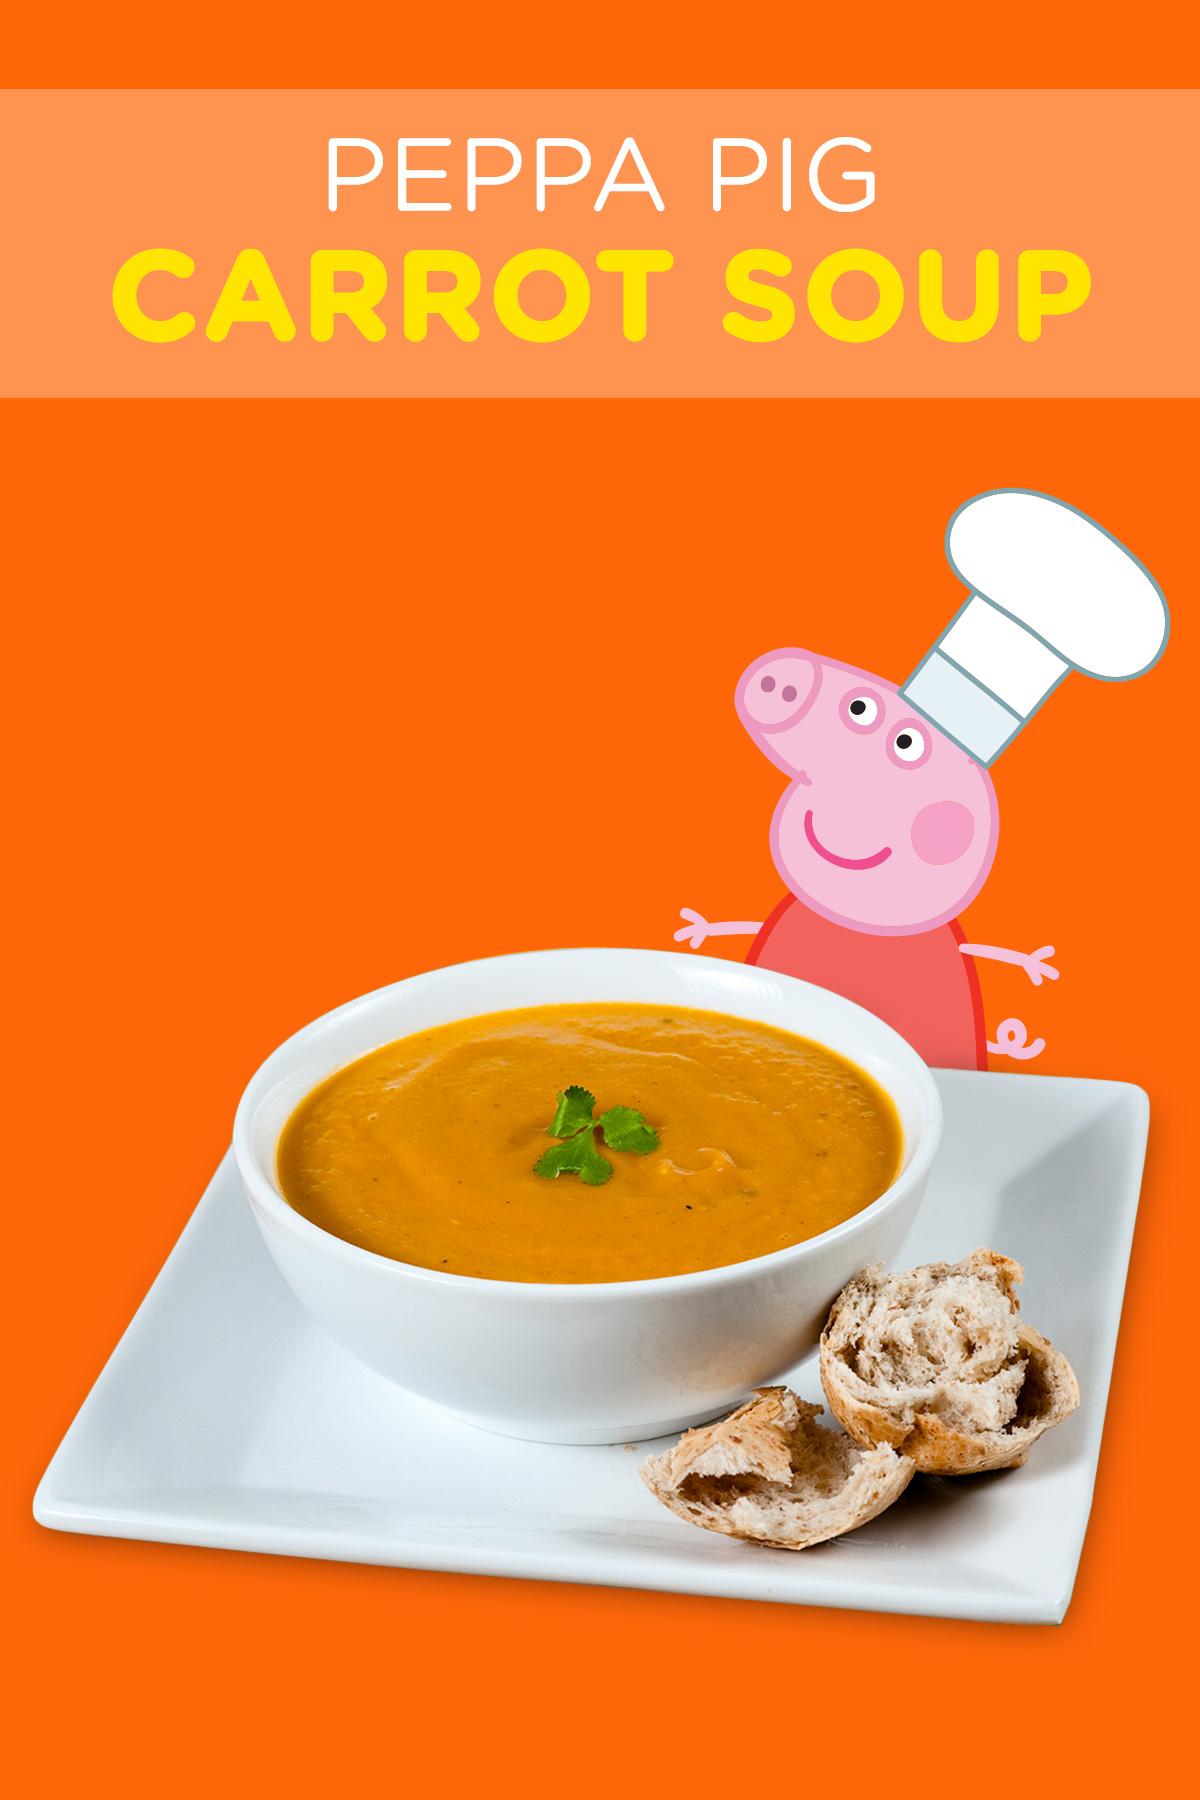 Peppa Pig Carrot Soup Recipe